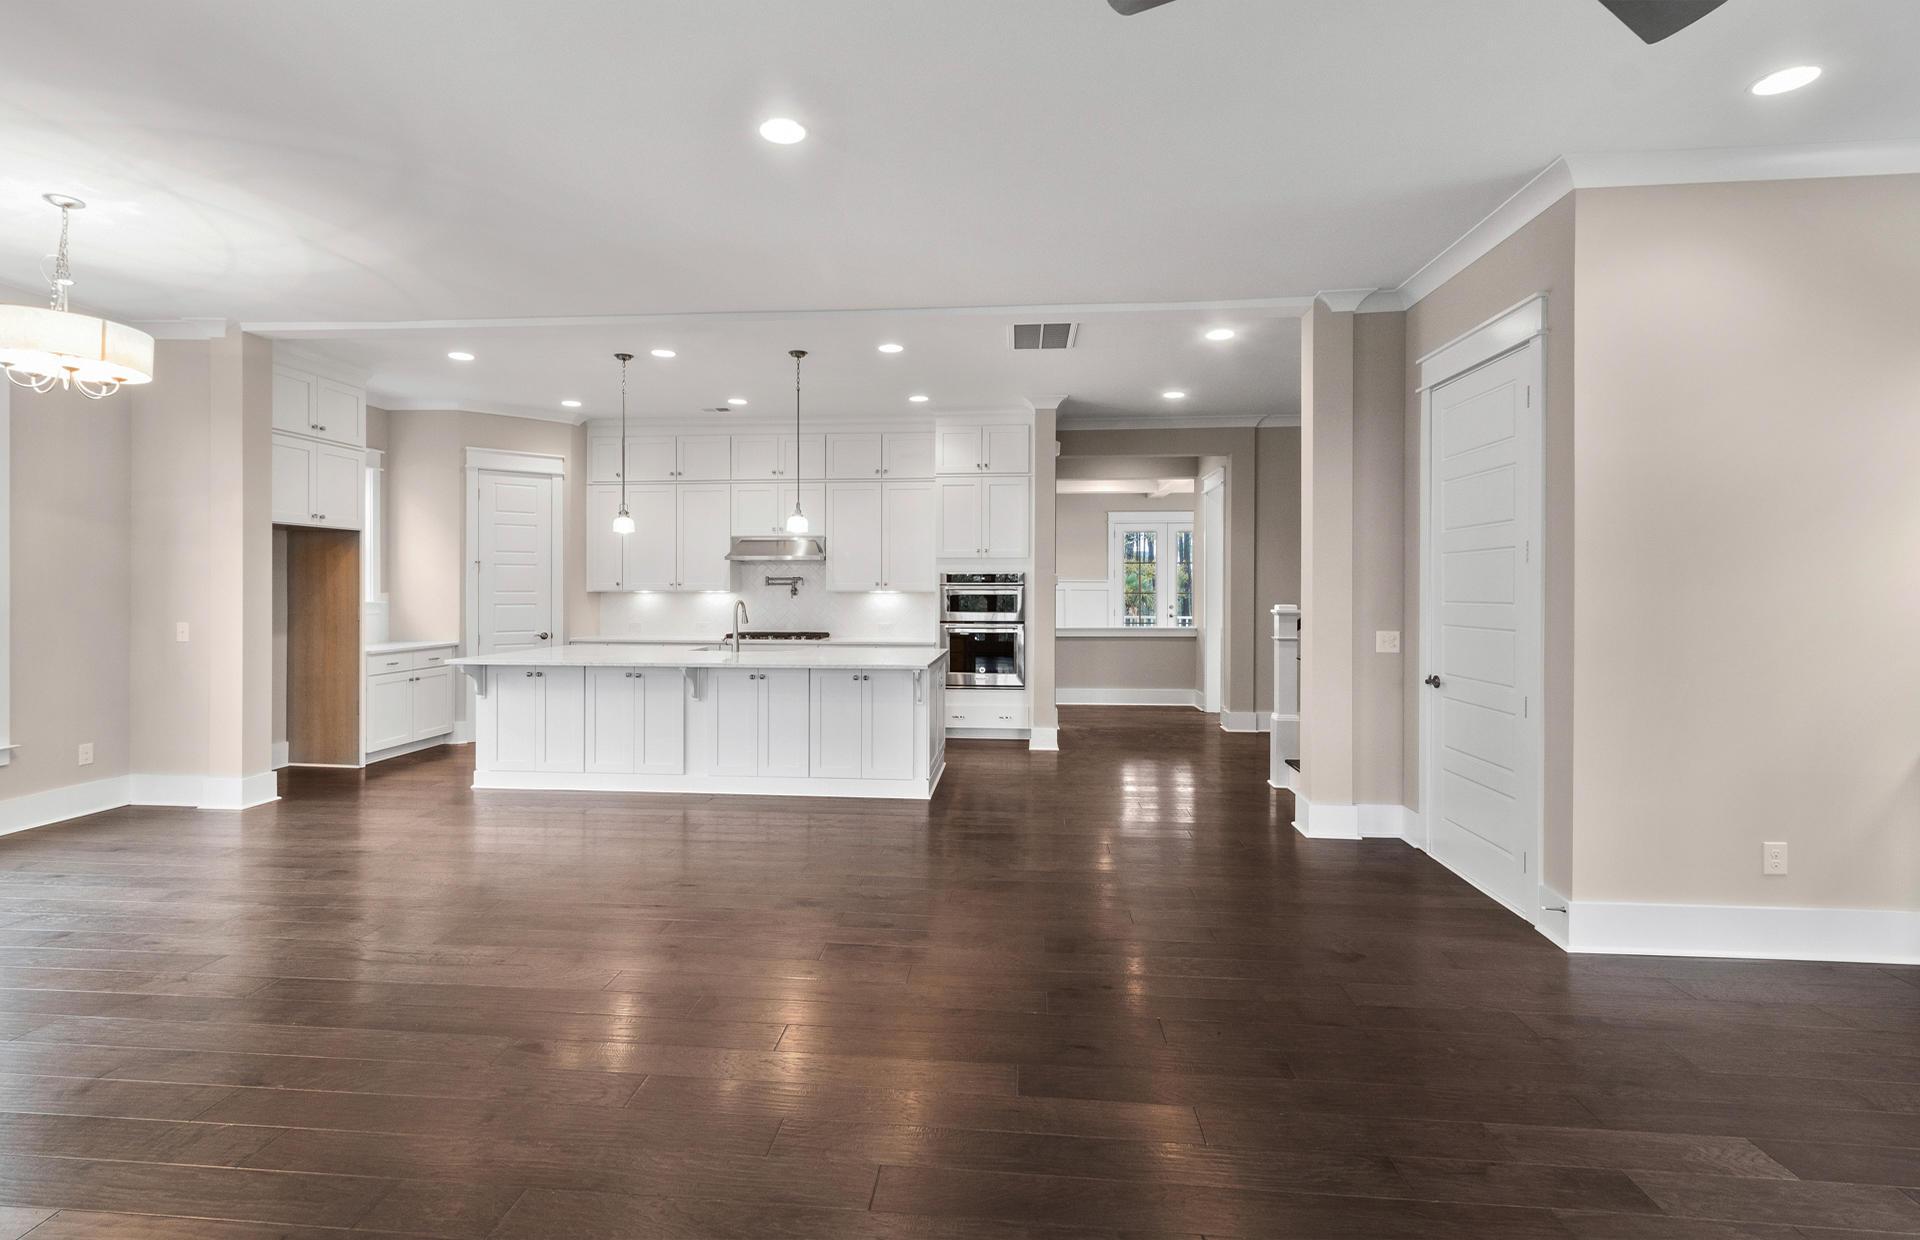 Dunes West Homes For Sale - 2320 Bucktail, Mount Pleasant, SC - 15